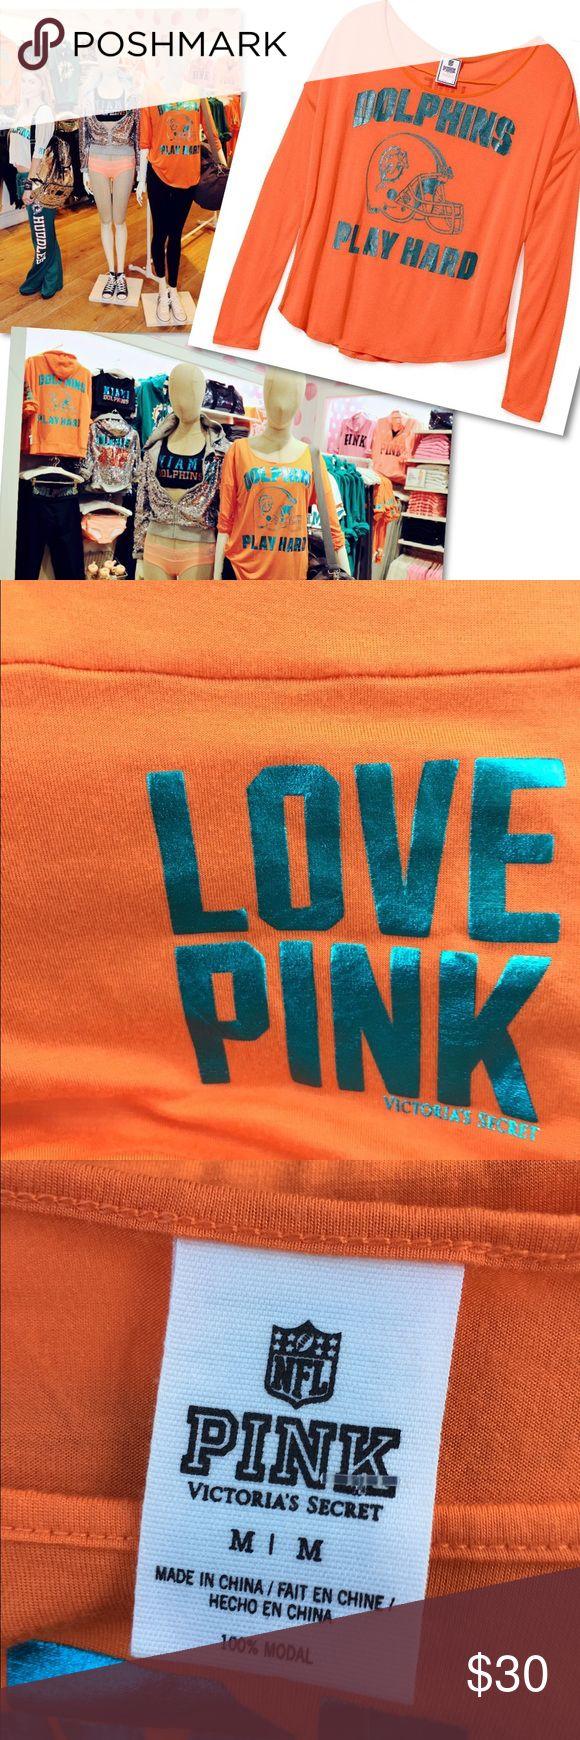 VICTORIA'S SECRET PINK MIAMI DOLPHINS NFL SHIRT VICTORIA'S SECRET PINK MIAMI DOLPHINS NFL SHIRT SZ M PINK Victoria's Secret Tops Tees - Long Sleeve